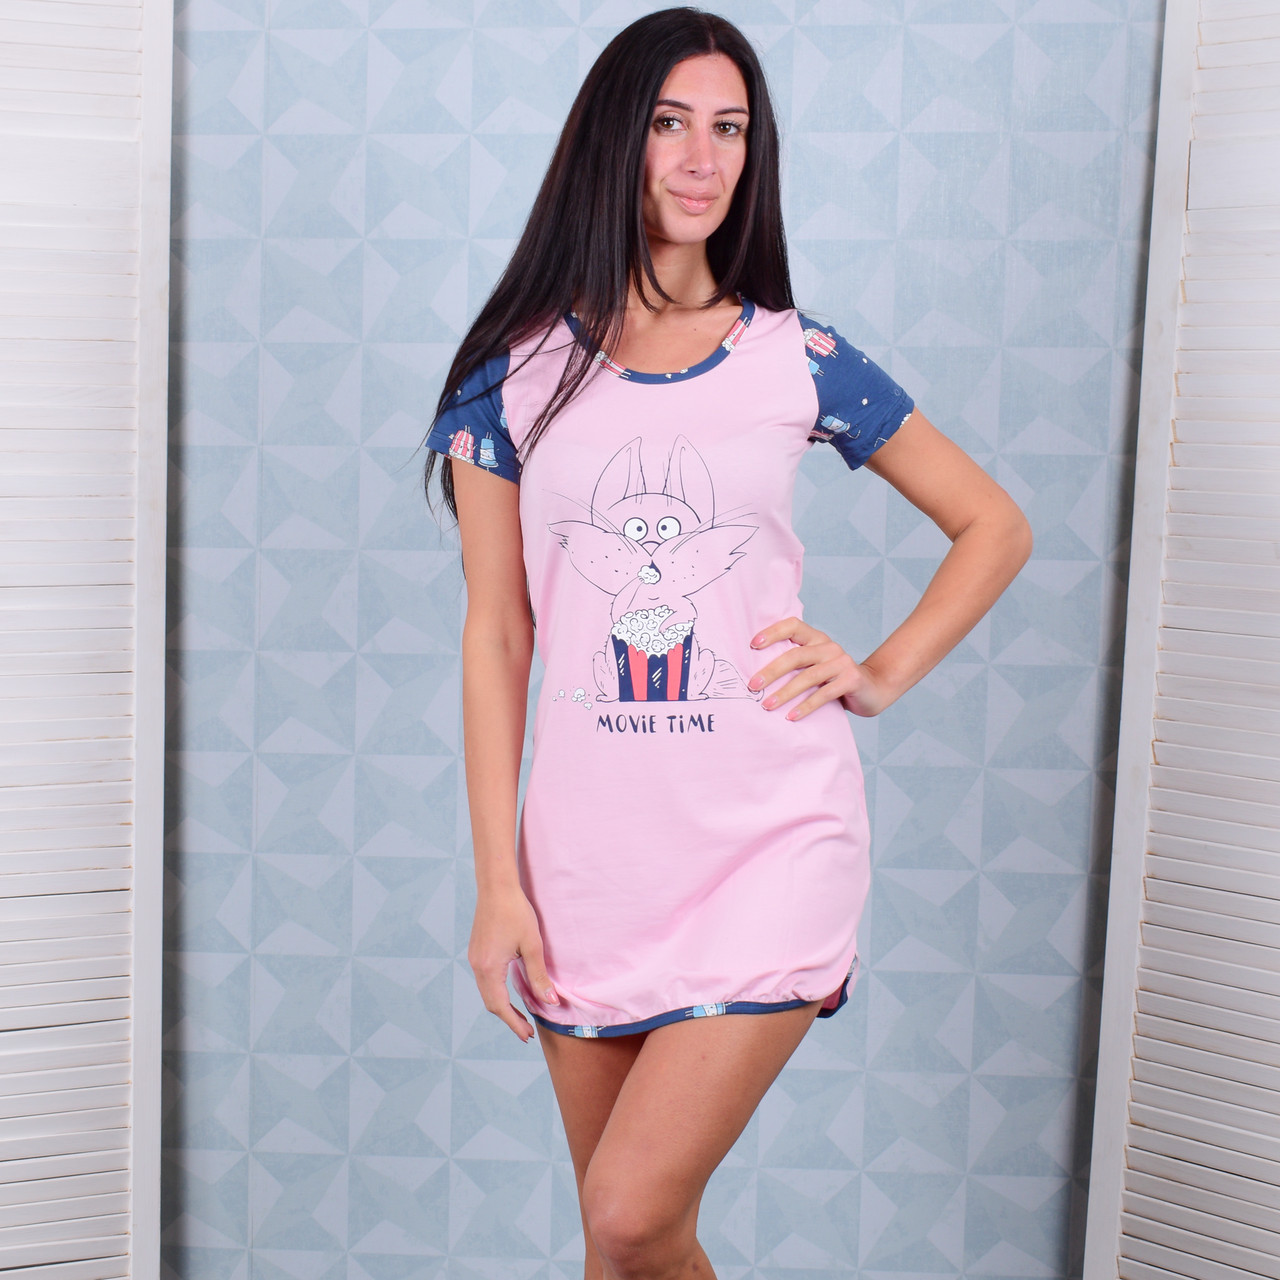 e9c32b8b231 Женская ночная рубашка Турция Pink Secret 4776 XXL. Размер 50-52 ...